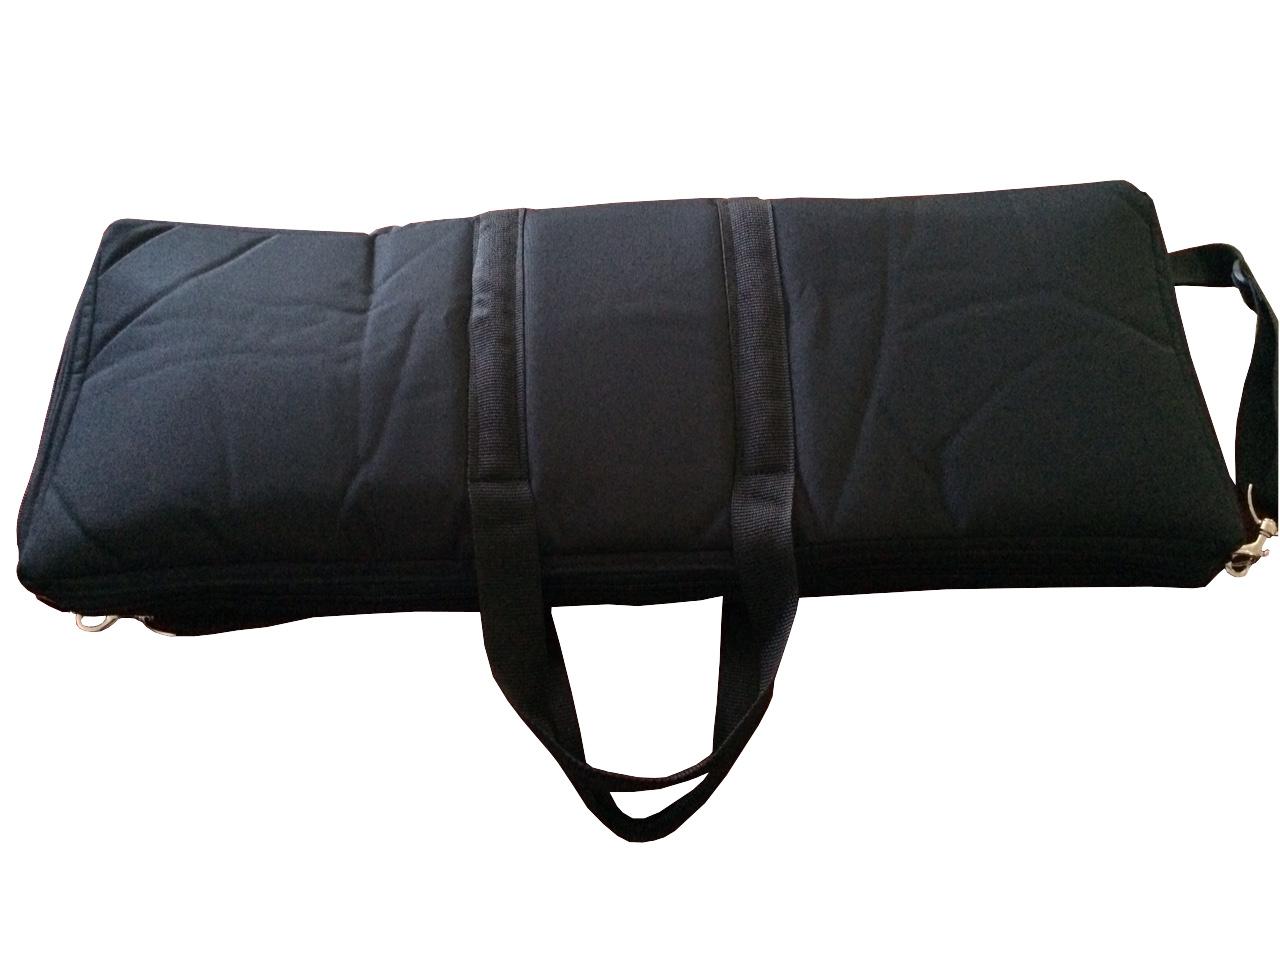 Keyboard Carrying Bag Closed